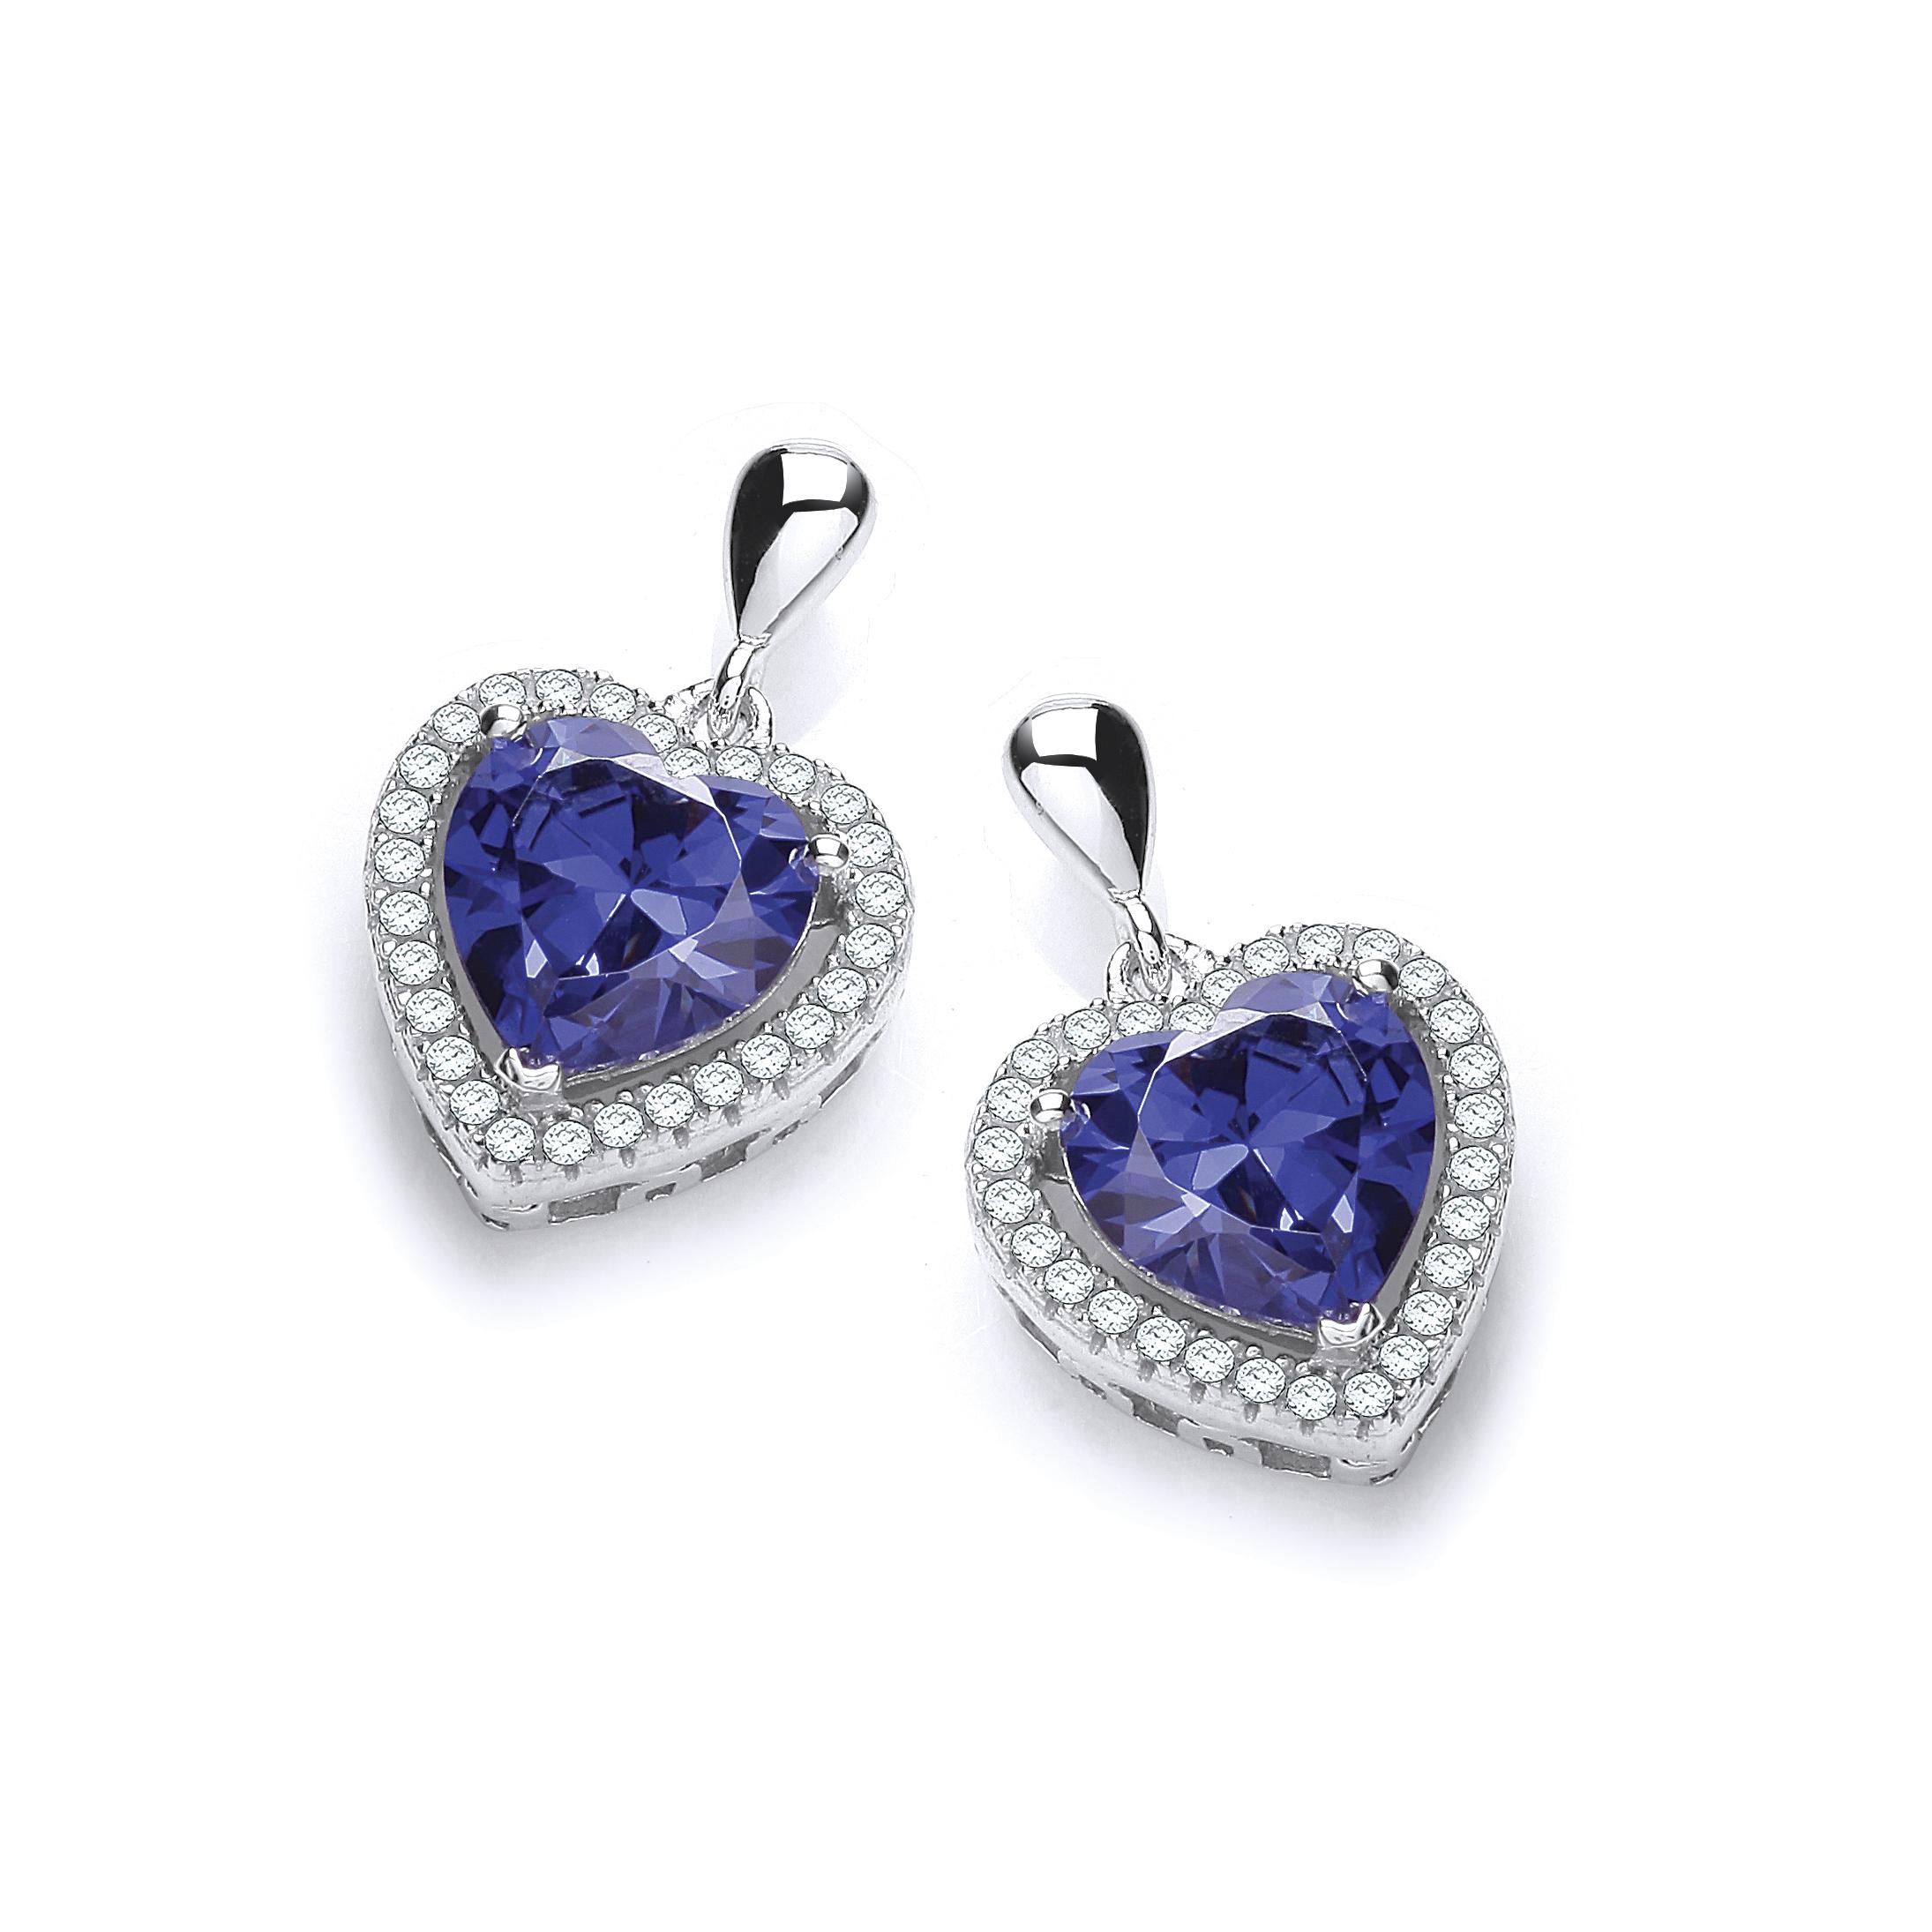 Micro Pave Blue Heart Cz Drop Earrings Hexyo London